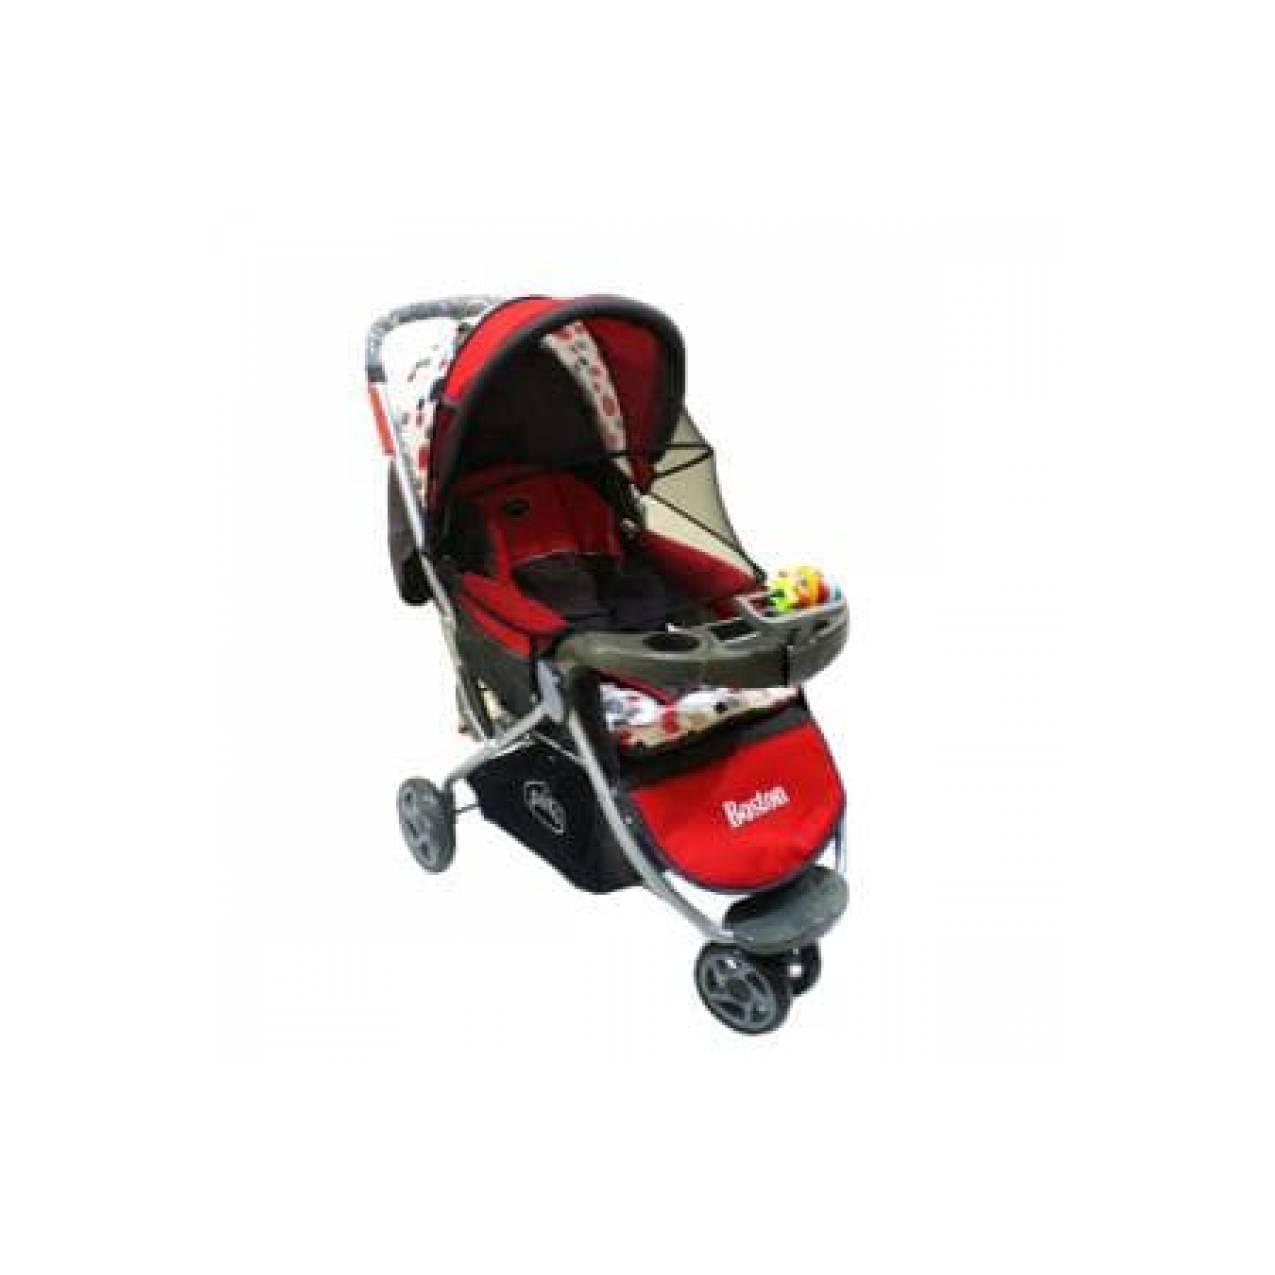 Stroller/Kereta Dorong Bayi Pliko Boston PK338 Roda 3 Limited